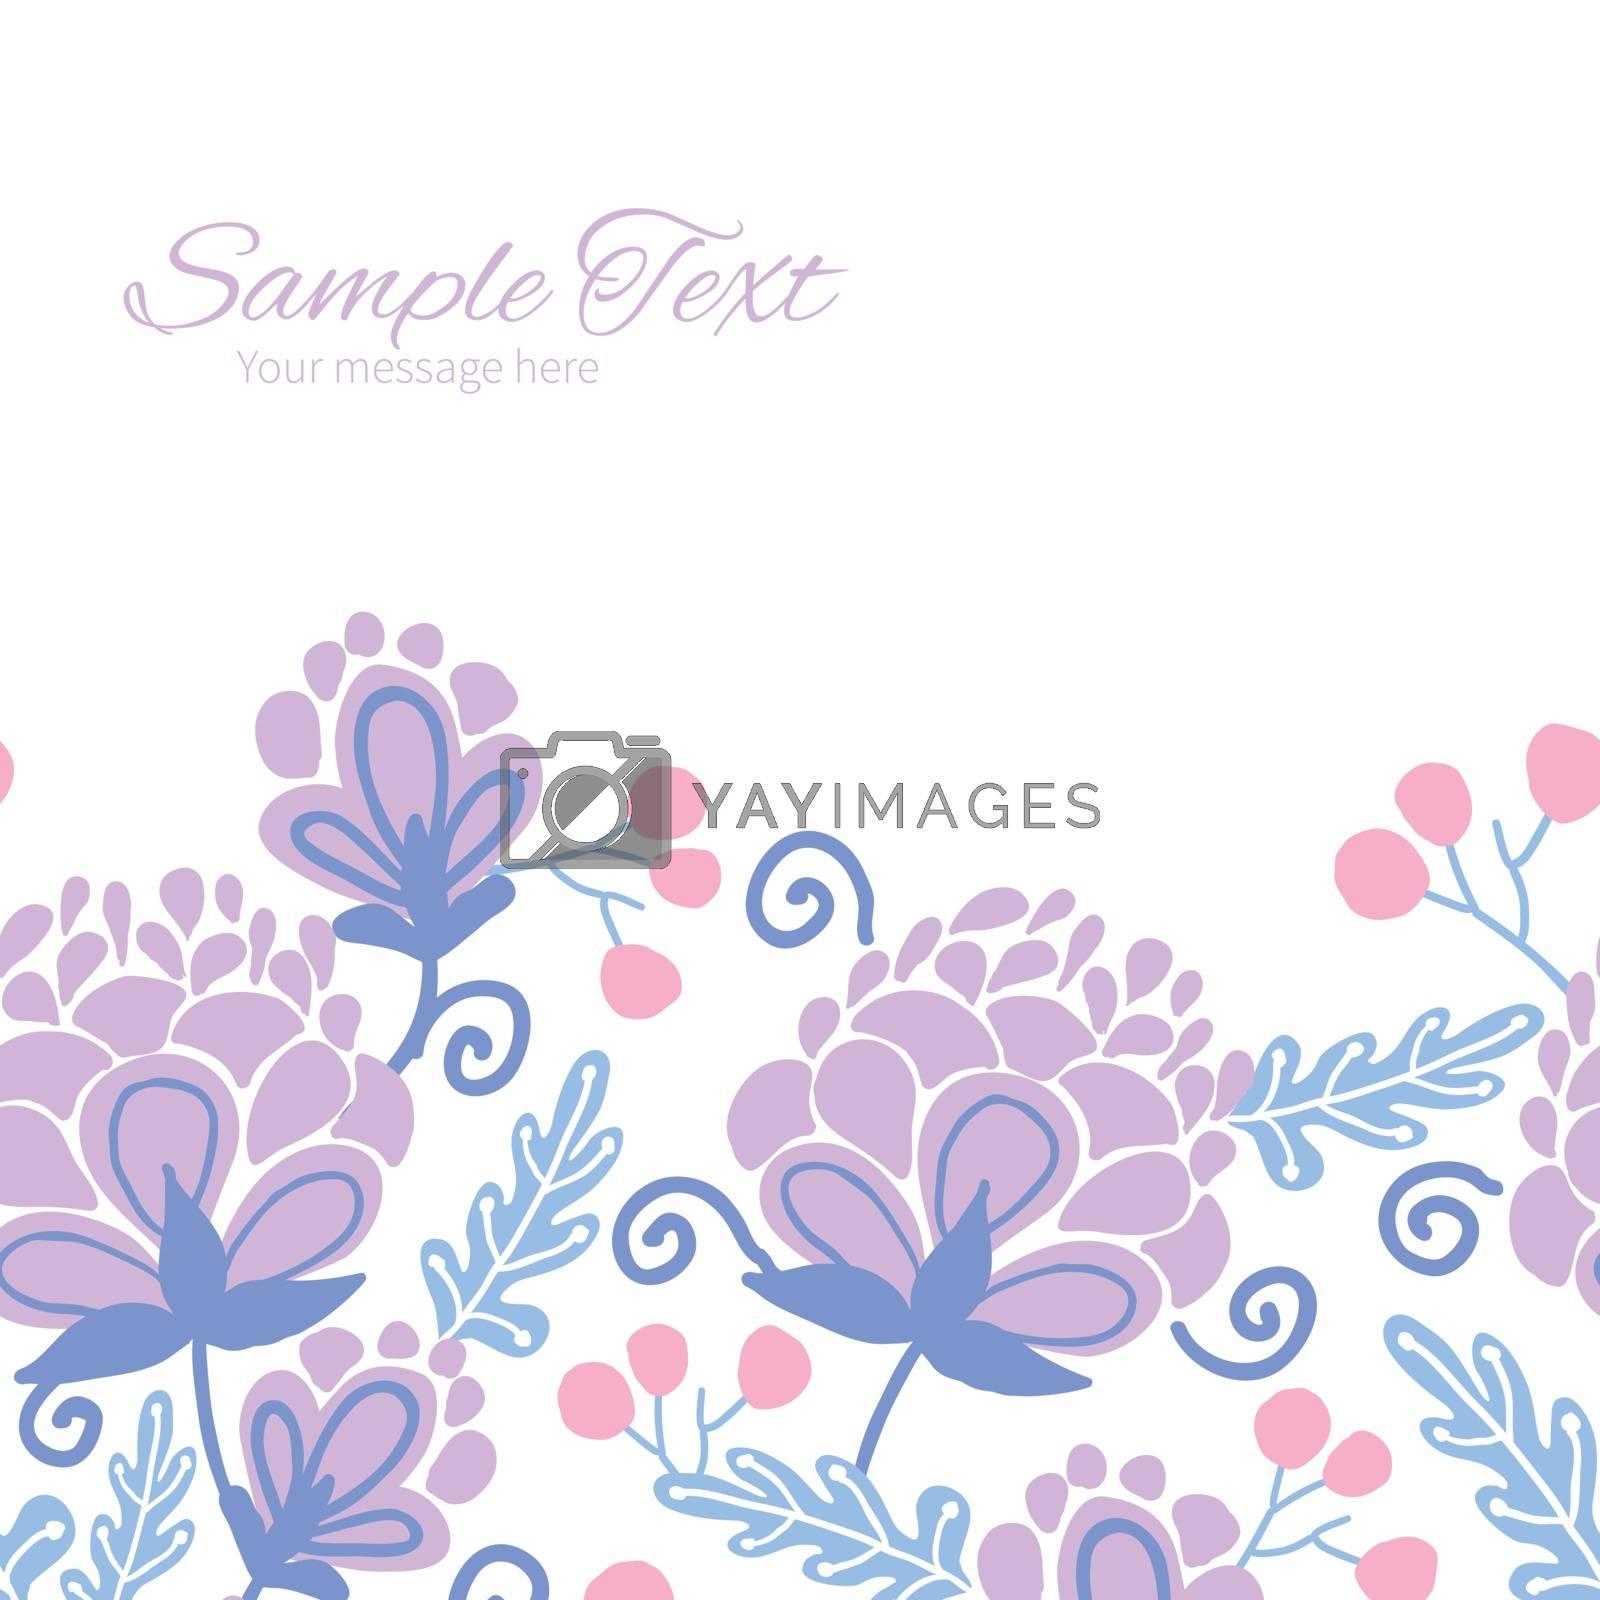 Vector soft purple flowers horizontal frame seamless pattern background graphic design